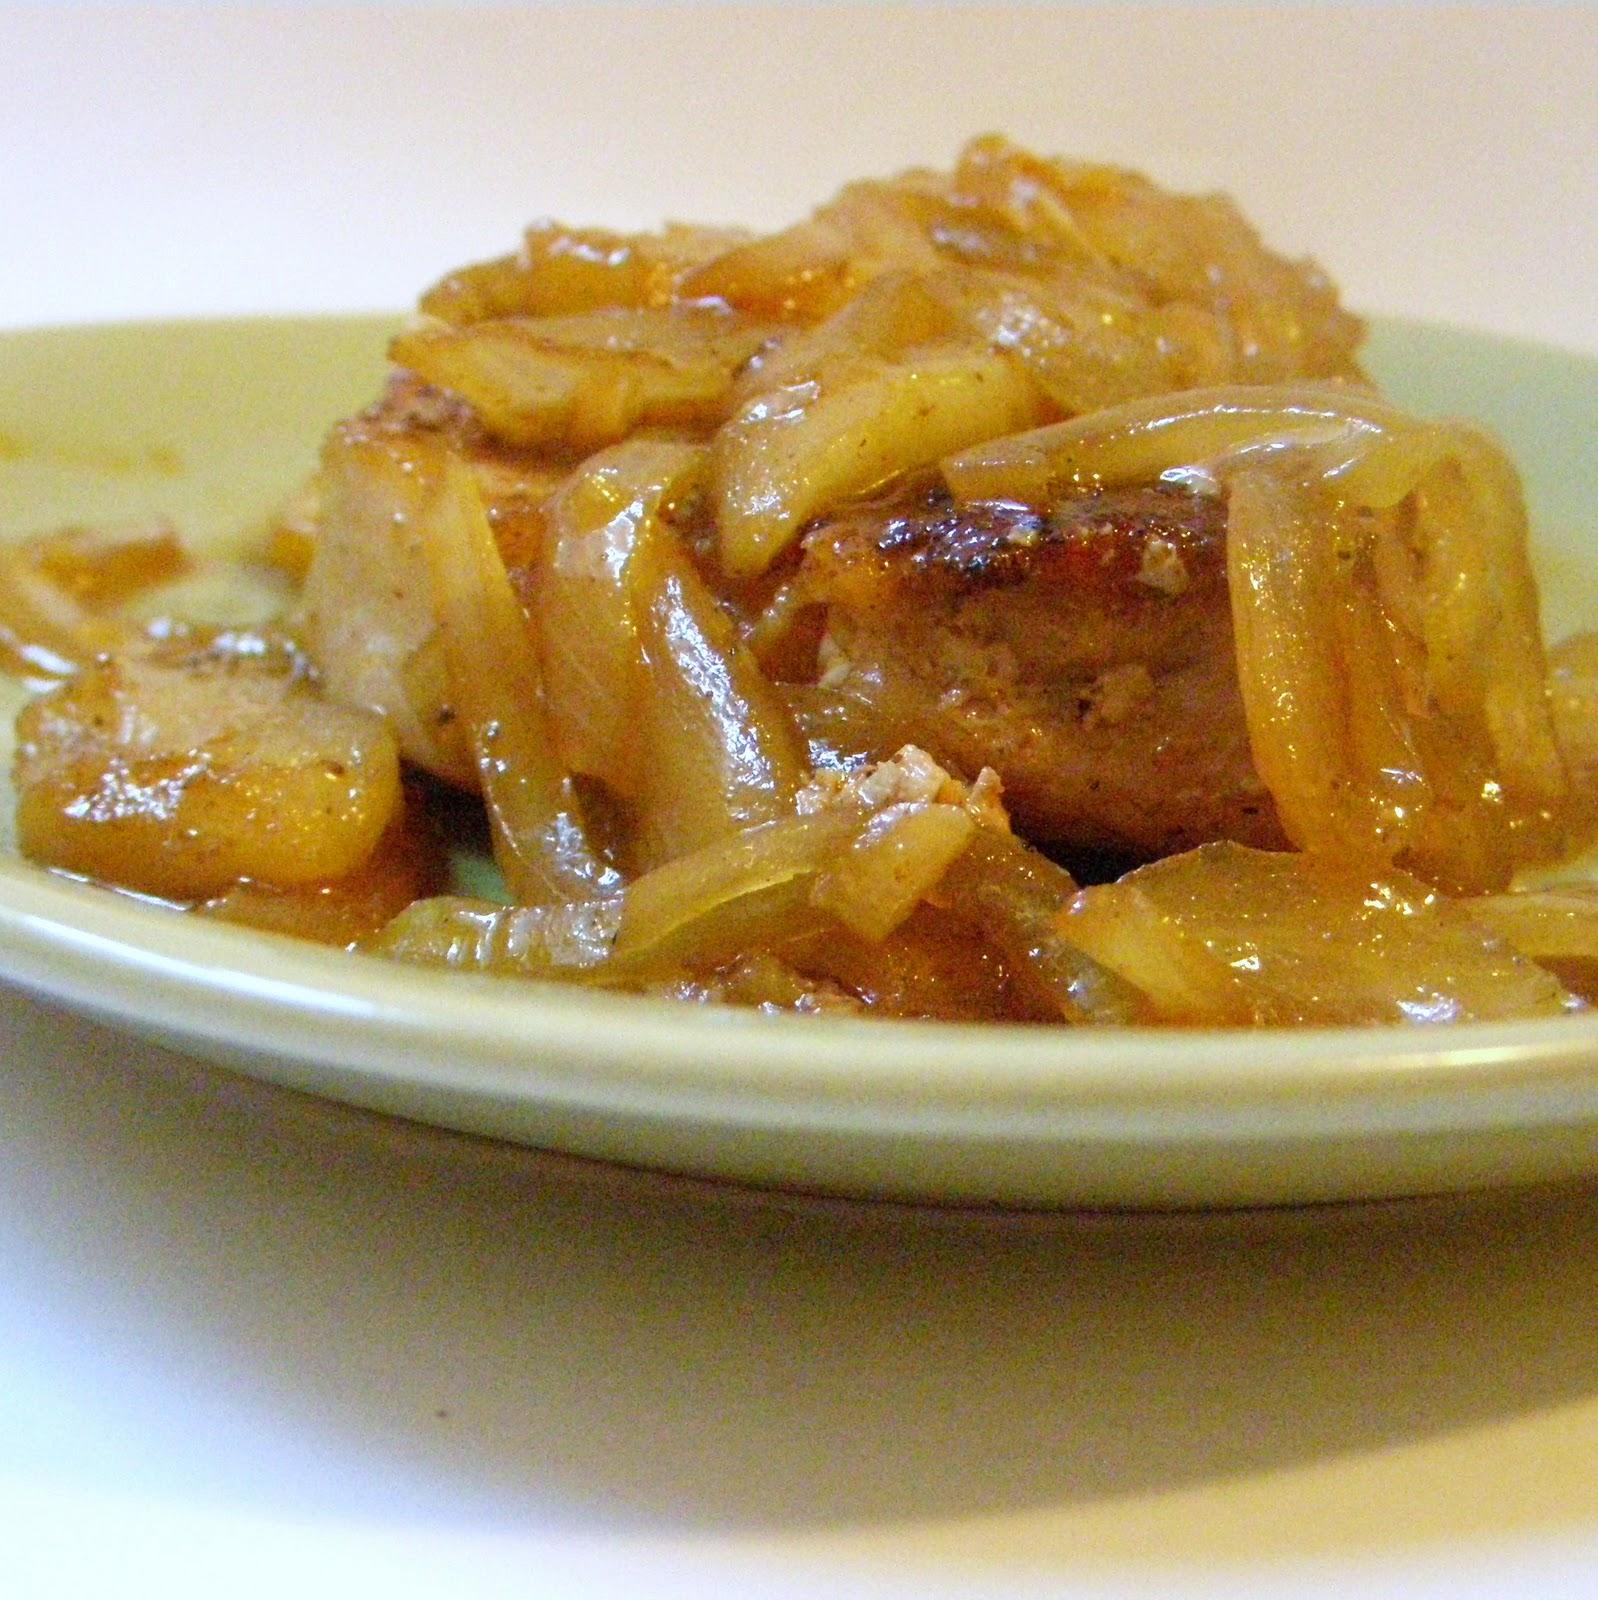 The Growing Foodie: Weeknight Dinner: Spiced Caramel Apple ...